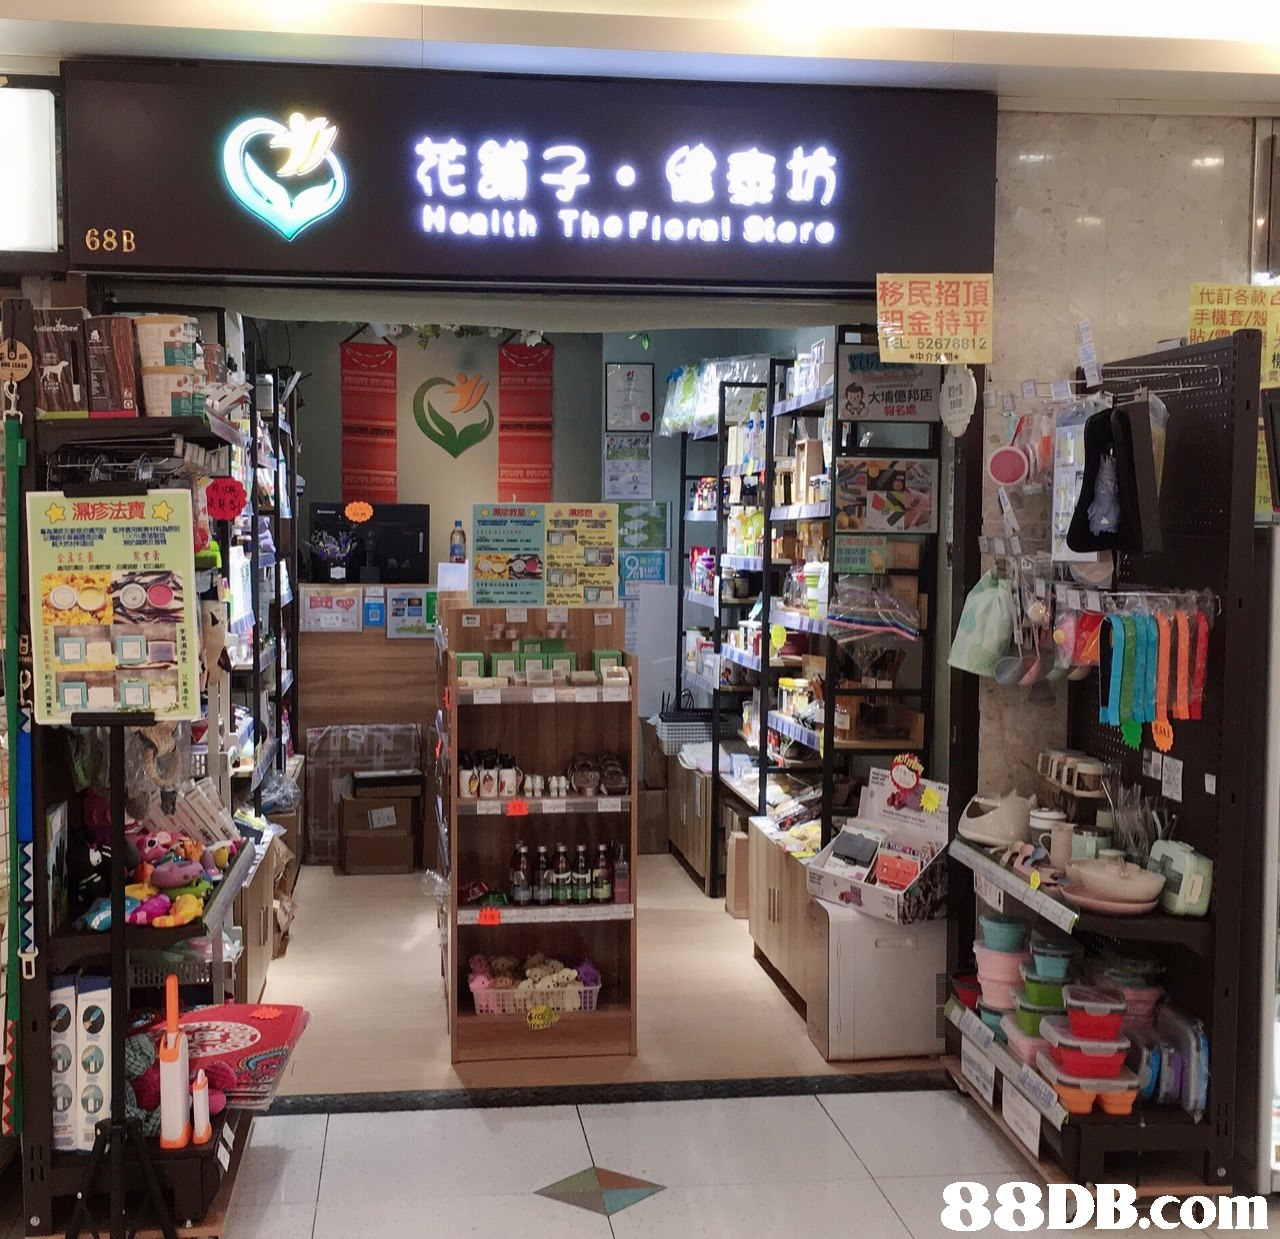 花 68B 移民招頂 代訂各款 金特平 TEL: 62678812   Product,Retail,Building,Outlet store,Convenience store